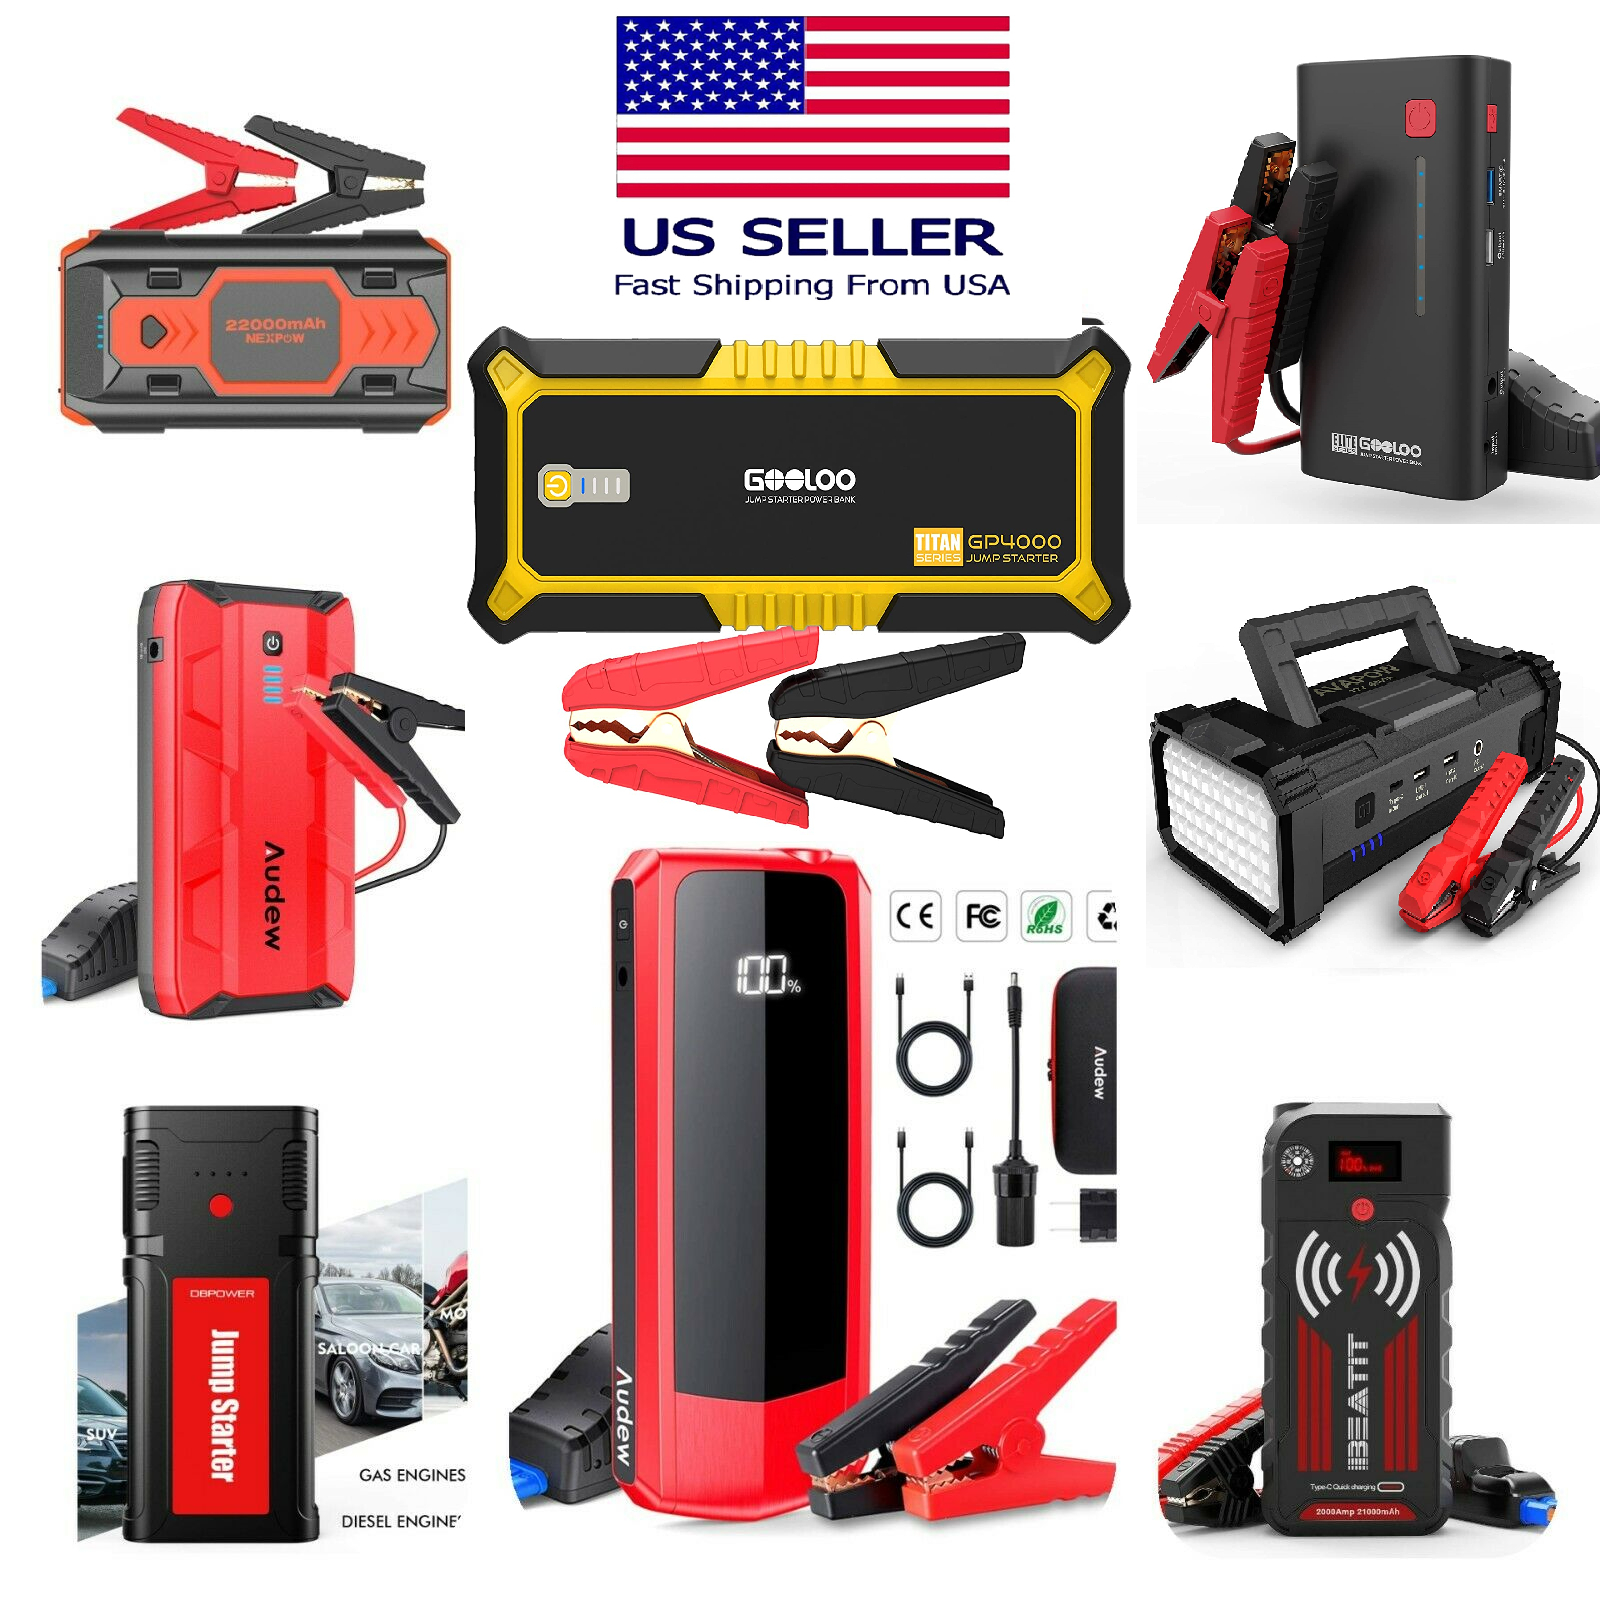 ⚡ NEW 12V Peak Car Jump Start Box Power Bank Battery Portable Mobile Charger